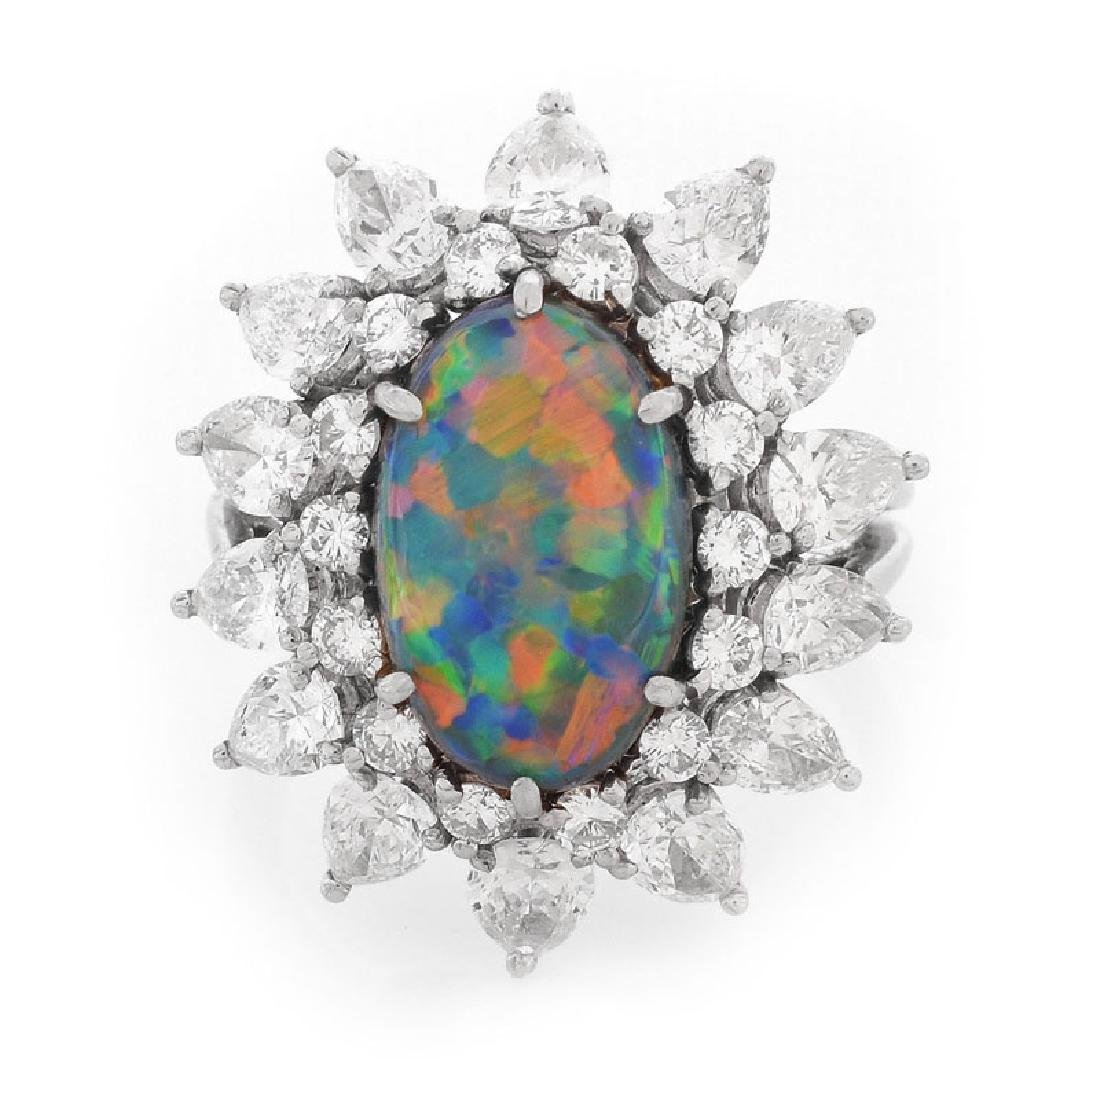 Vintage Tiffany & Co Oval Cabochon Black Opal, Pear